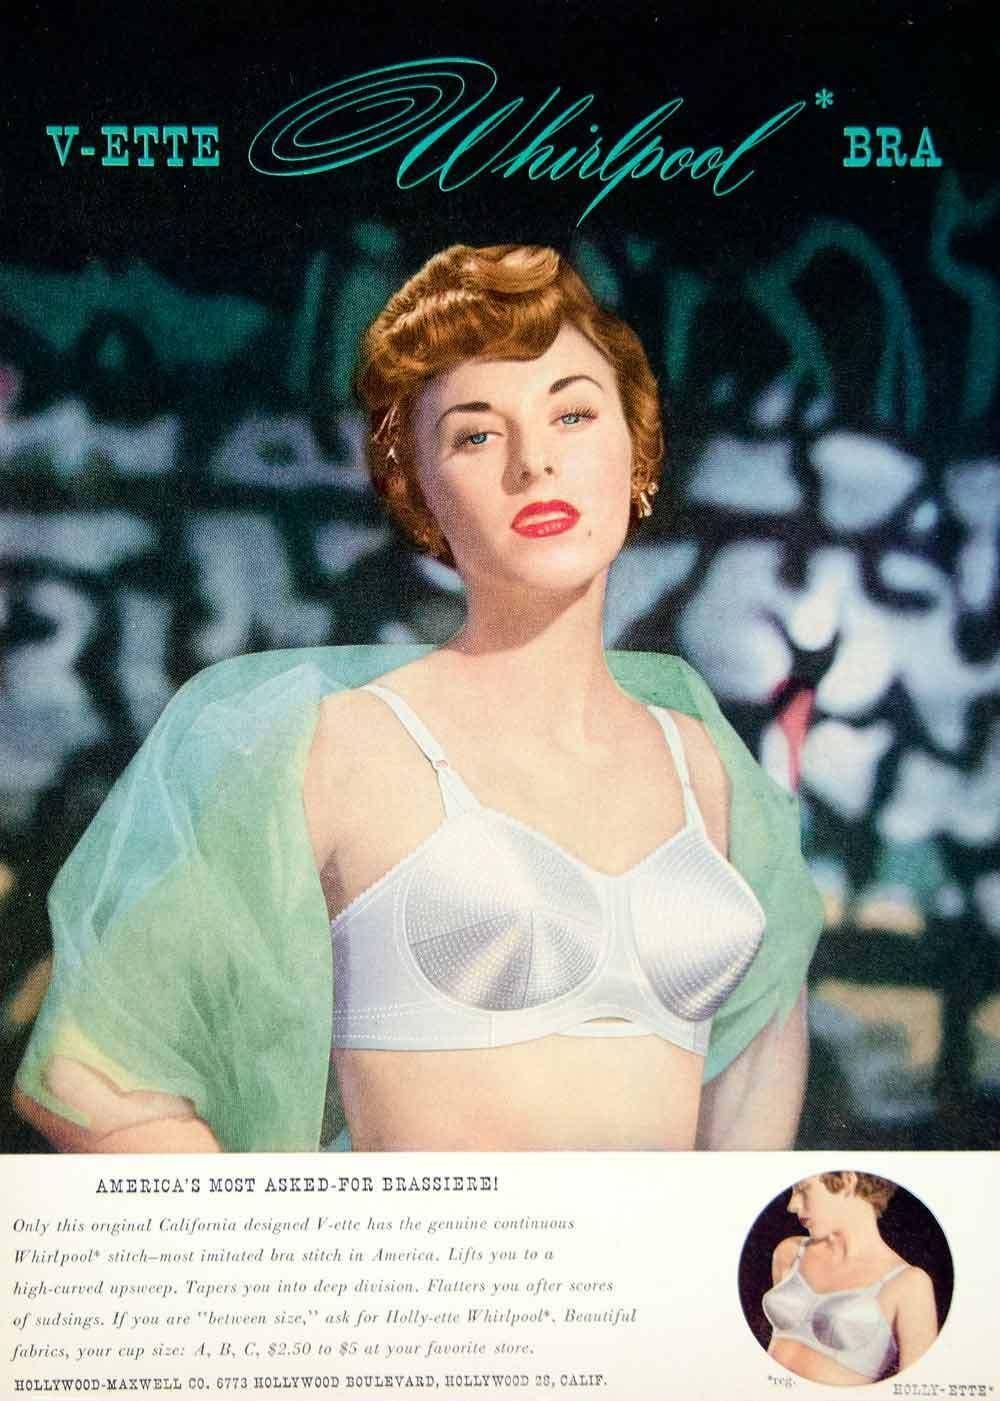 591559de50 1949 Ad V-ette Whirlpool Bra Brassiere Hollywood-Maxwell Underwear 40s  Fashion